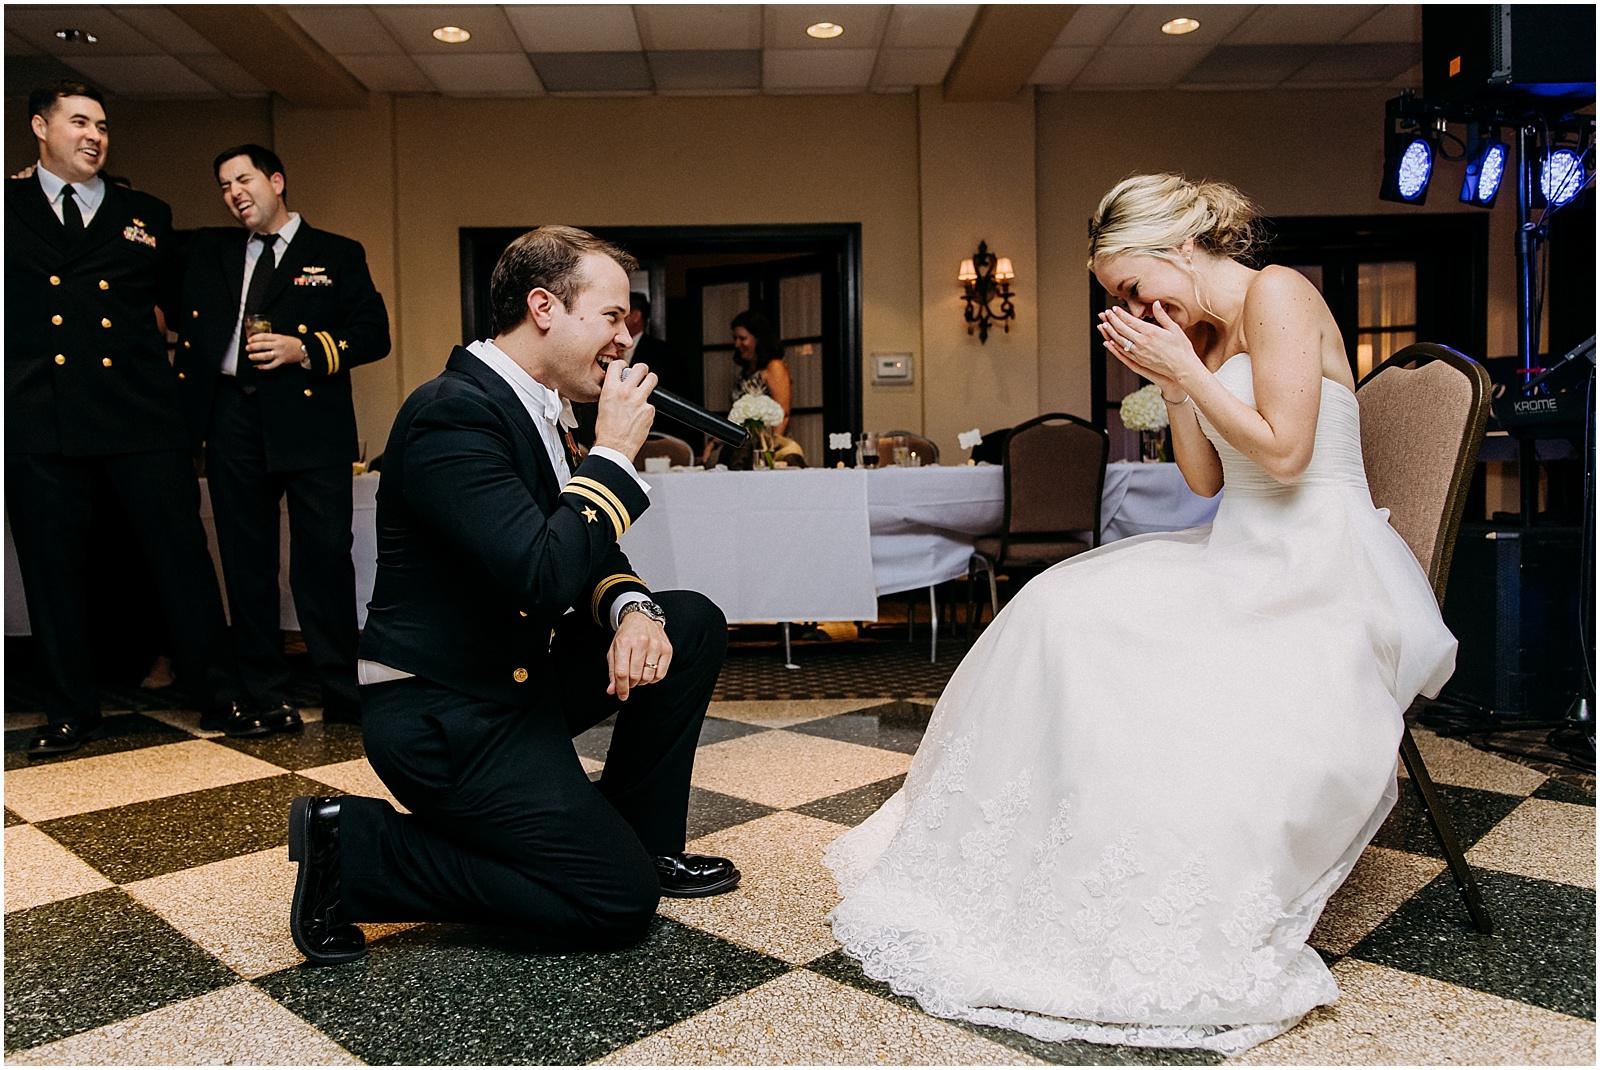 glen_echo_st_louis_mo_wedding_0149.jpg